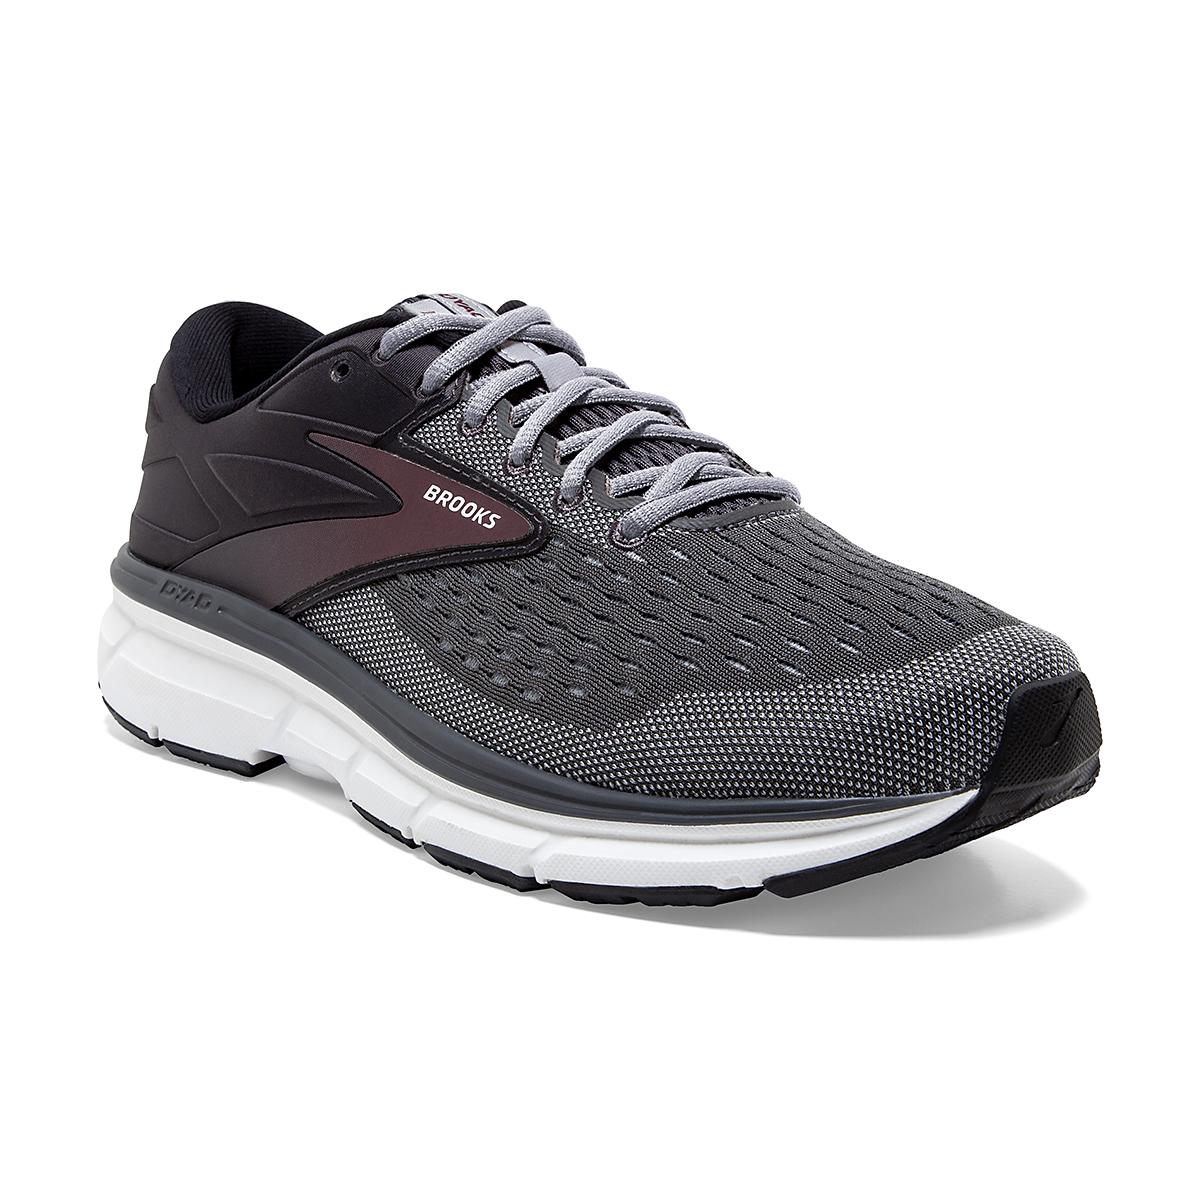 Men's Brooks Dyad 11 Running Shoe - Color: Blackened Pearl  - Size: 7 - Width: Regular, Blackened Pearl, large, image 5